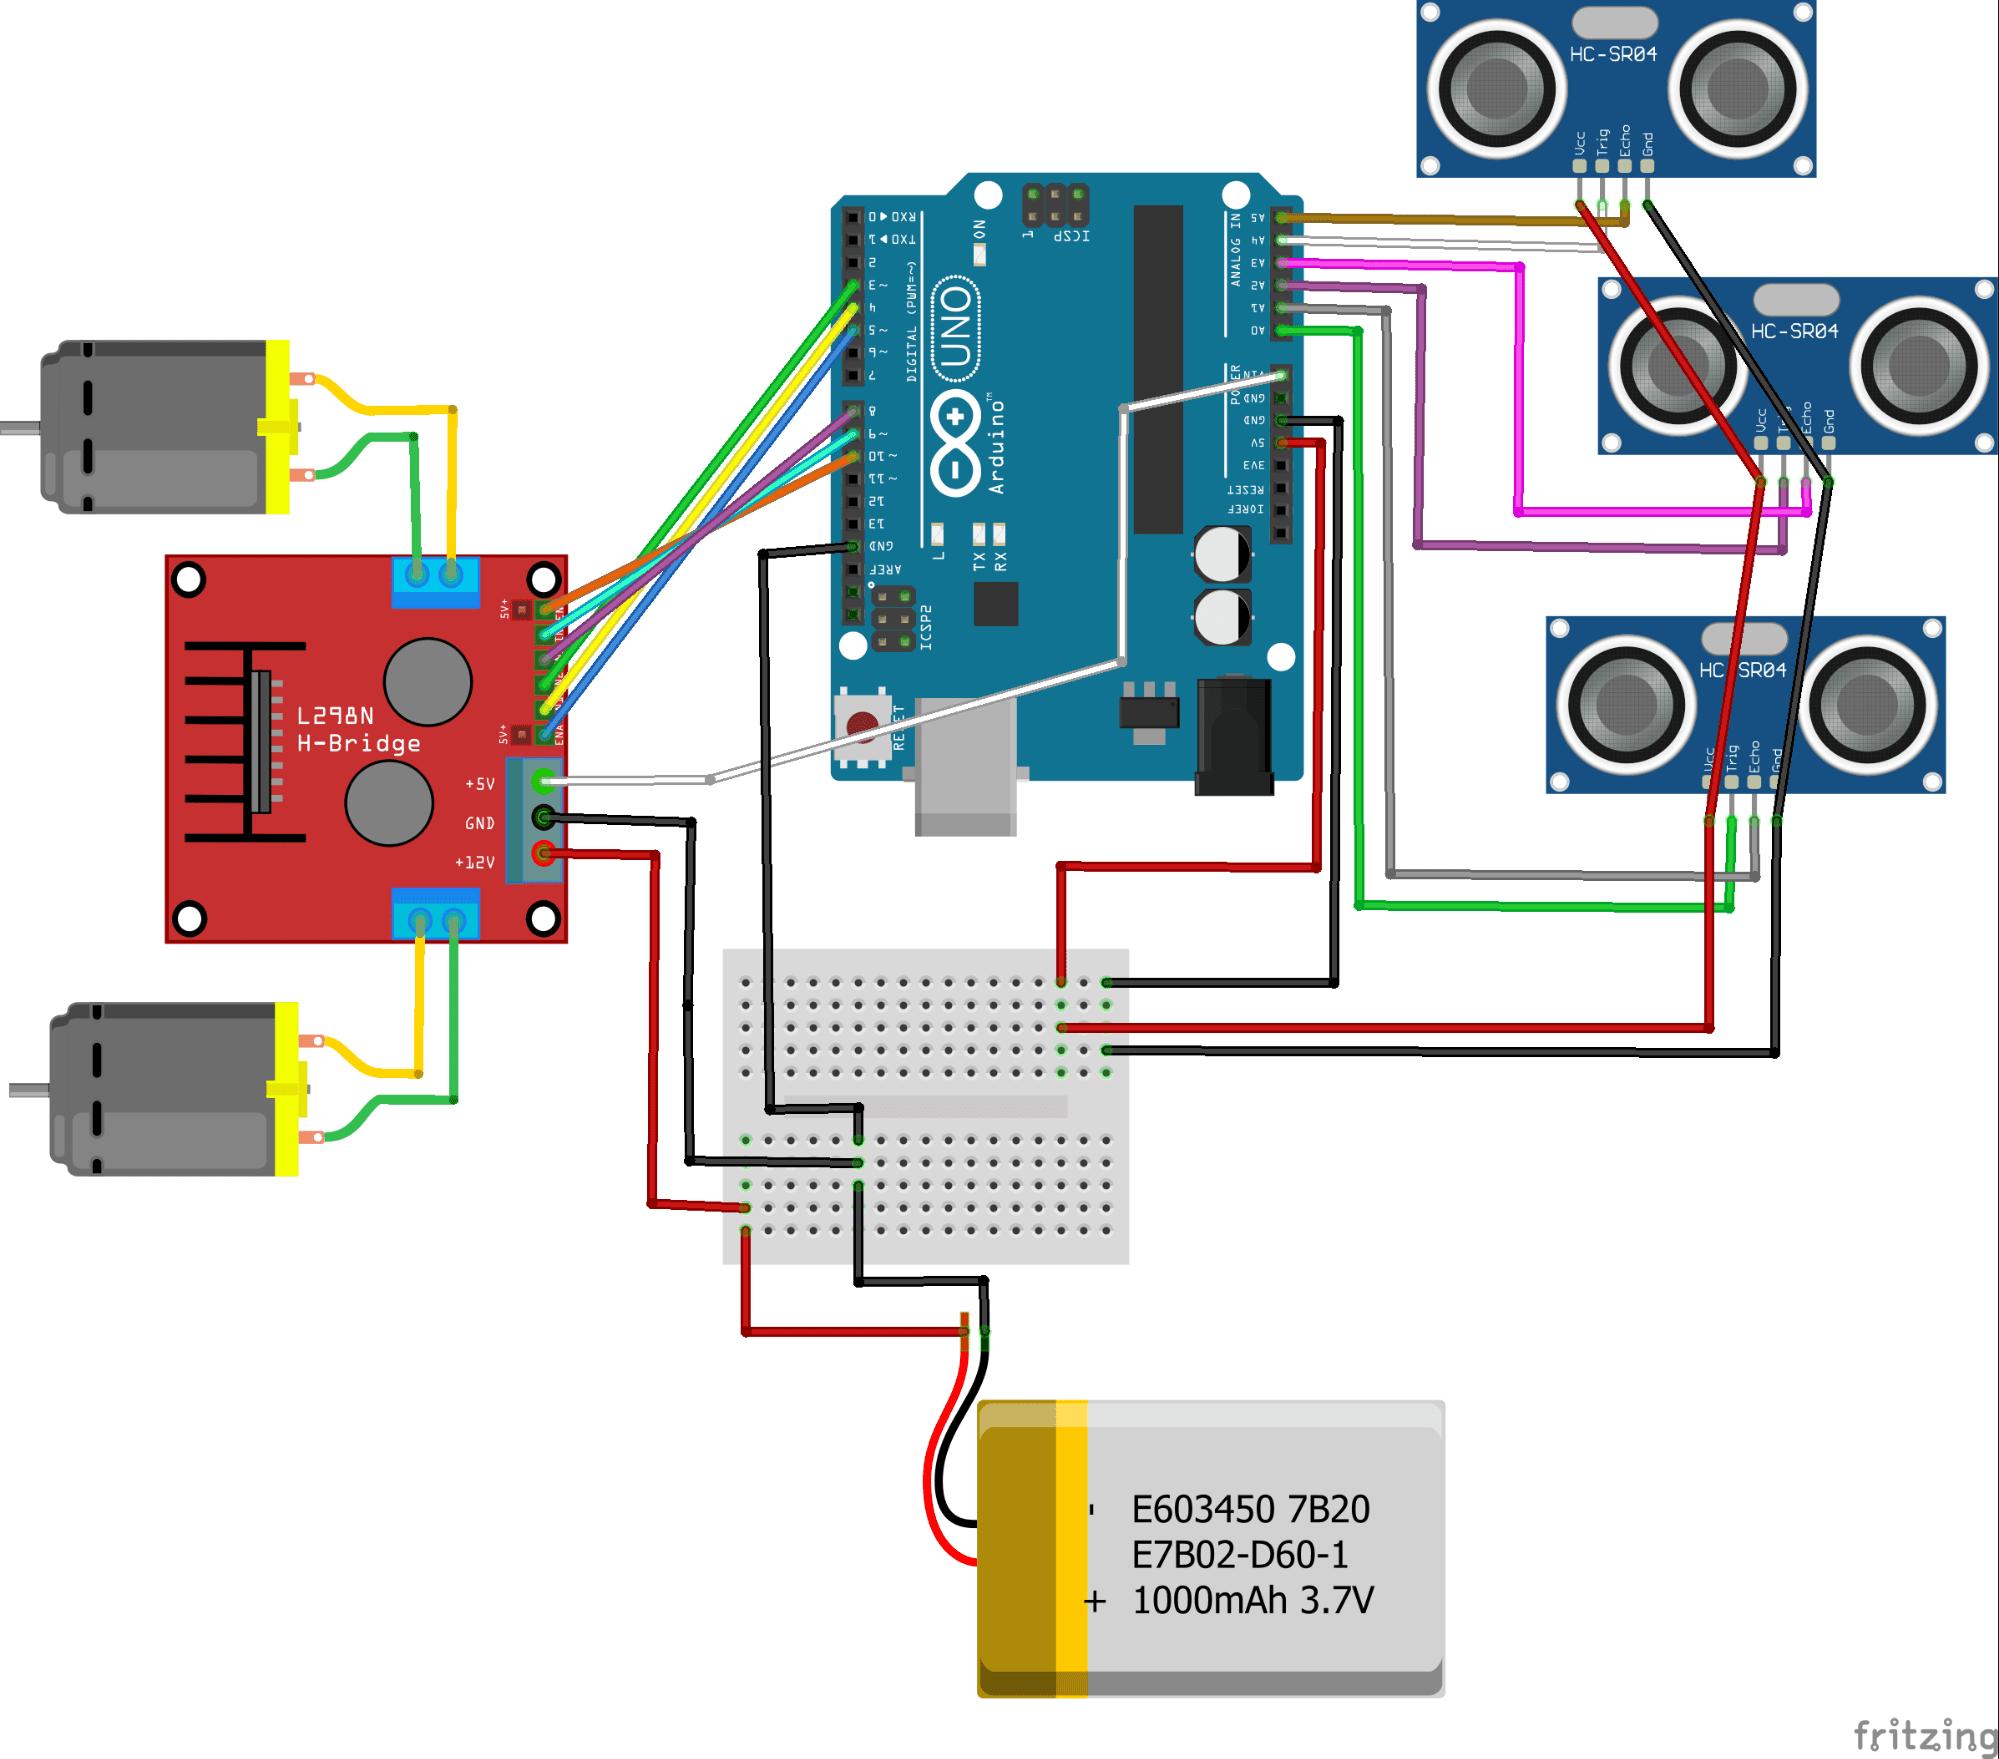 Arduino_Maze_Solver_JW_MP_image17.png